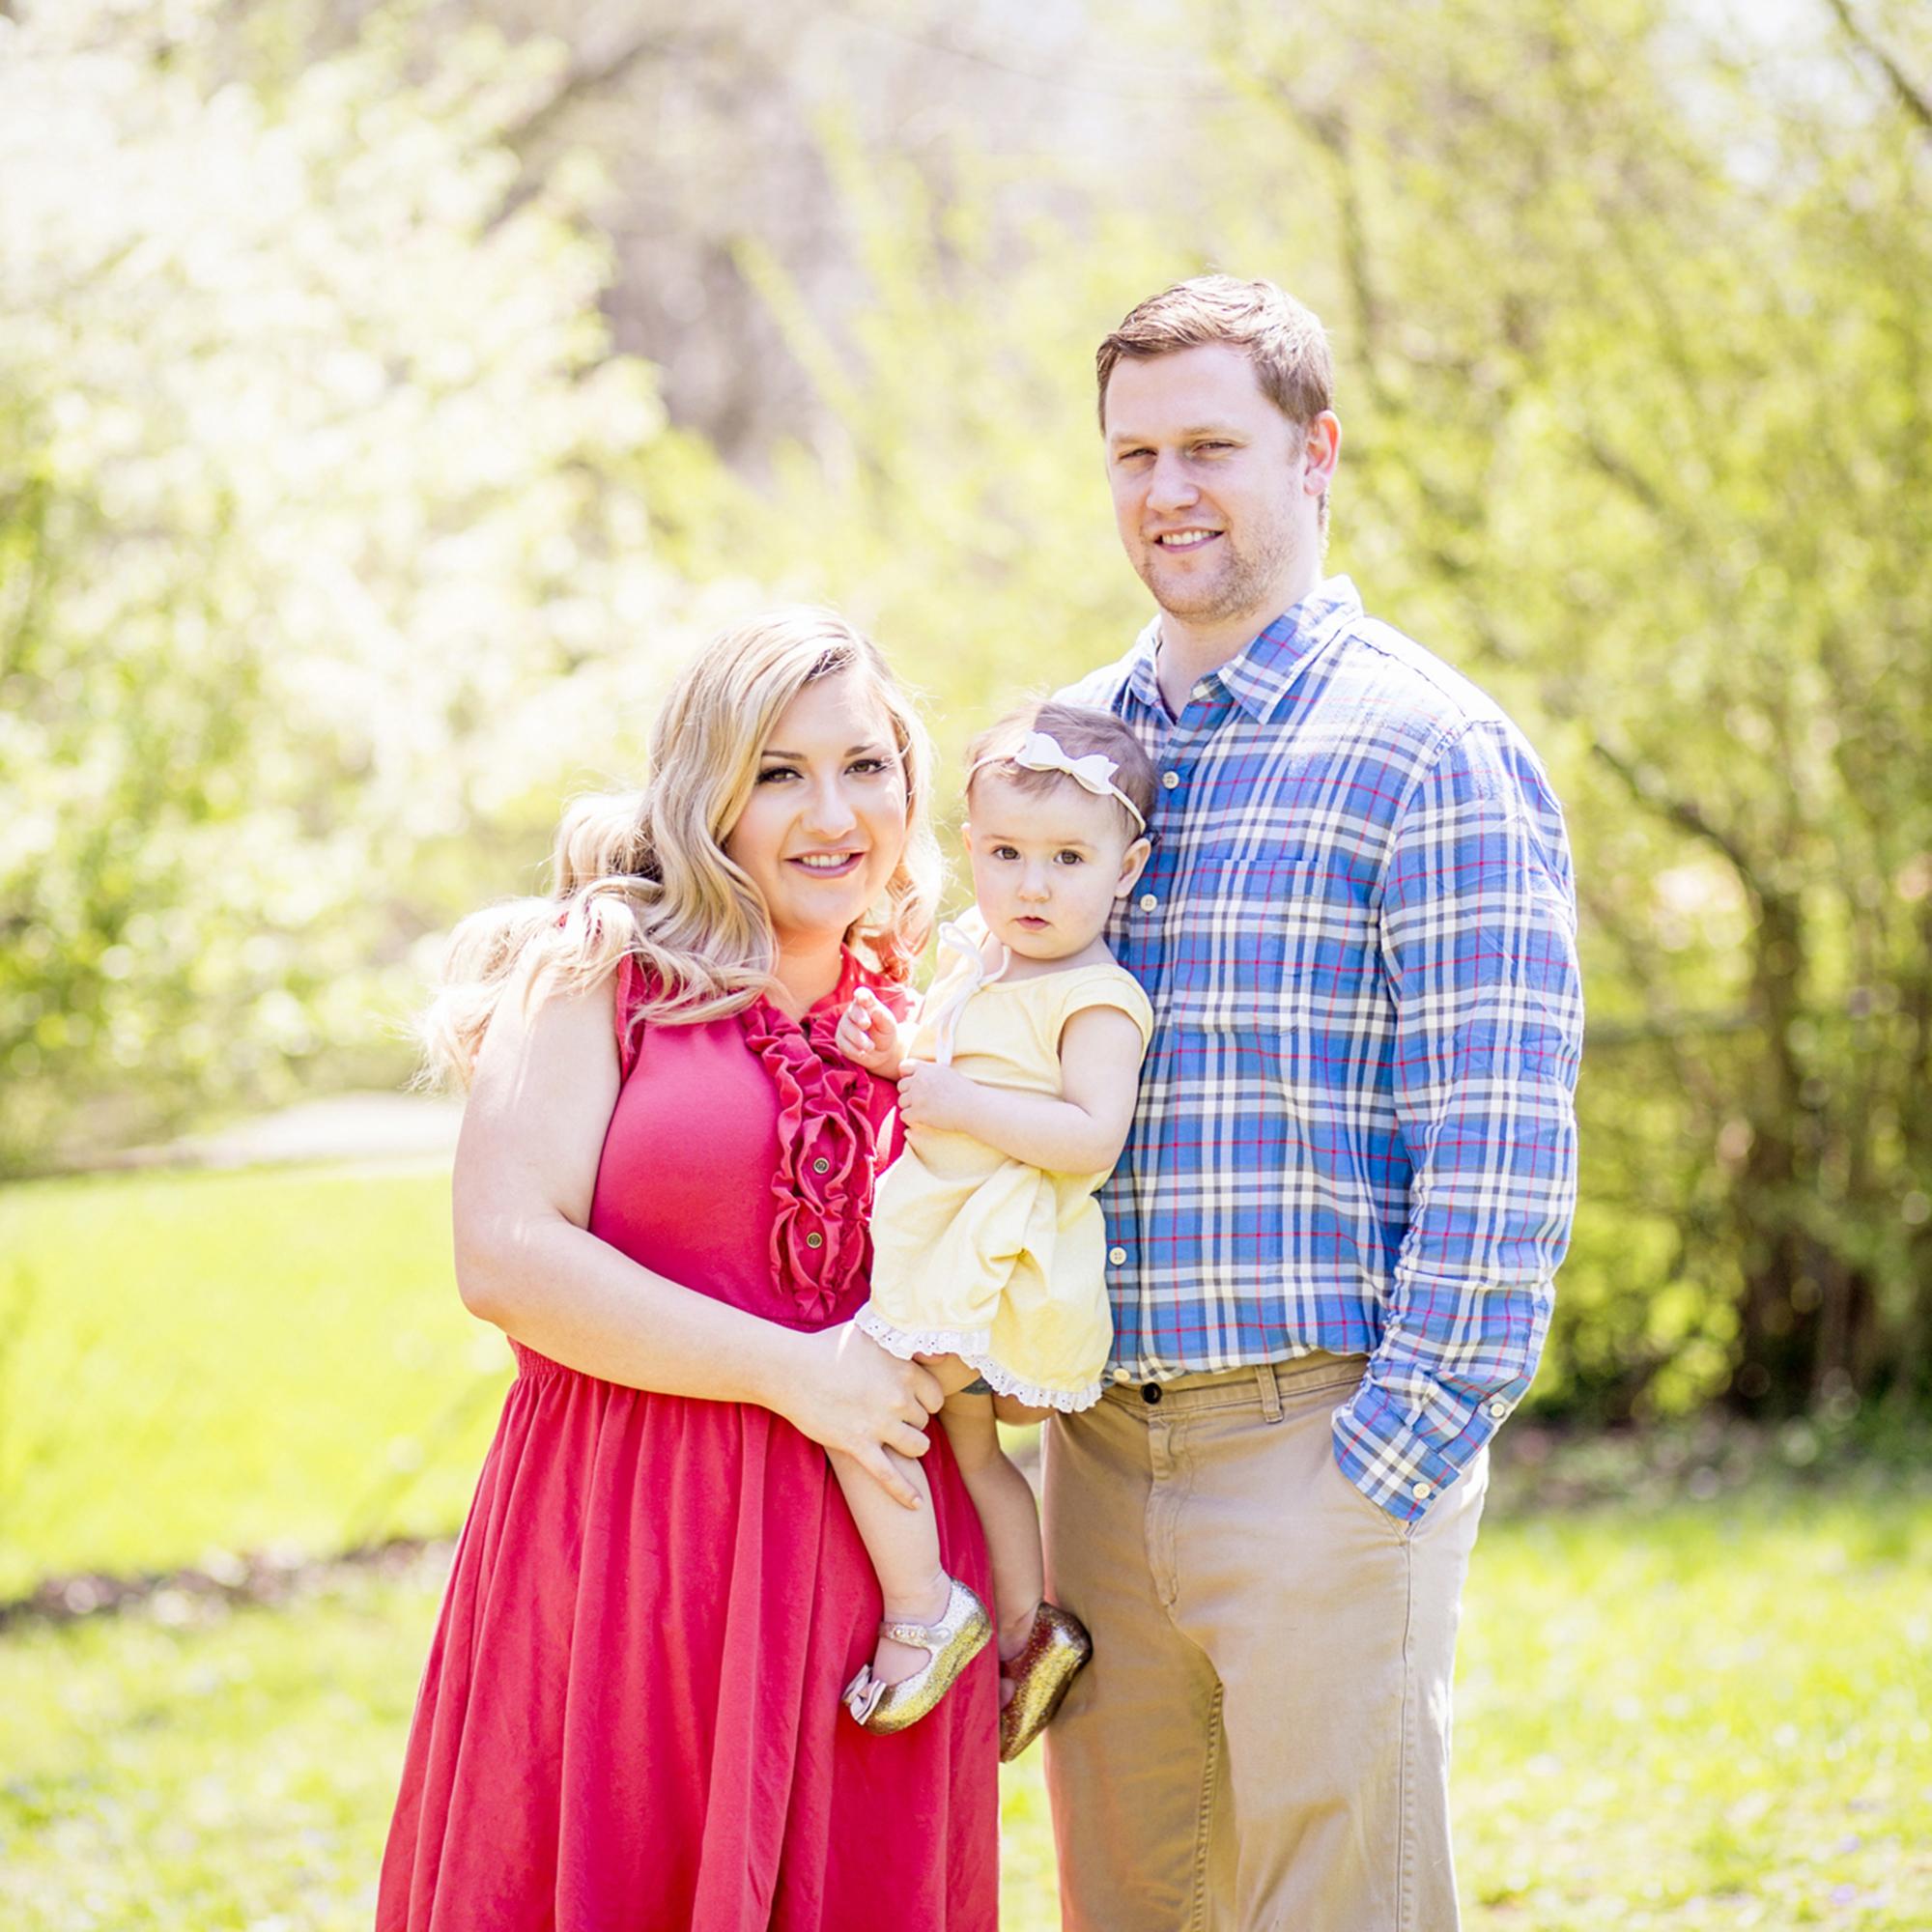 Seriously_Sabrina_Photography_Ashland_Kentucky_family_One_Year_Belle20.jpg